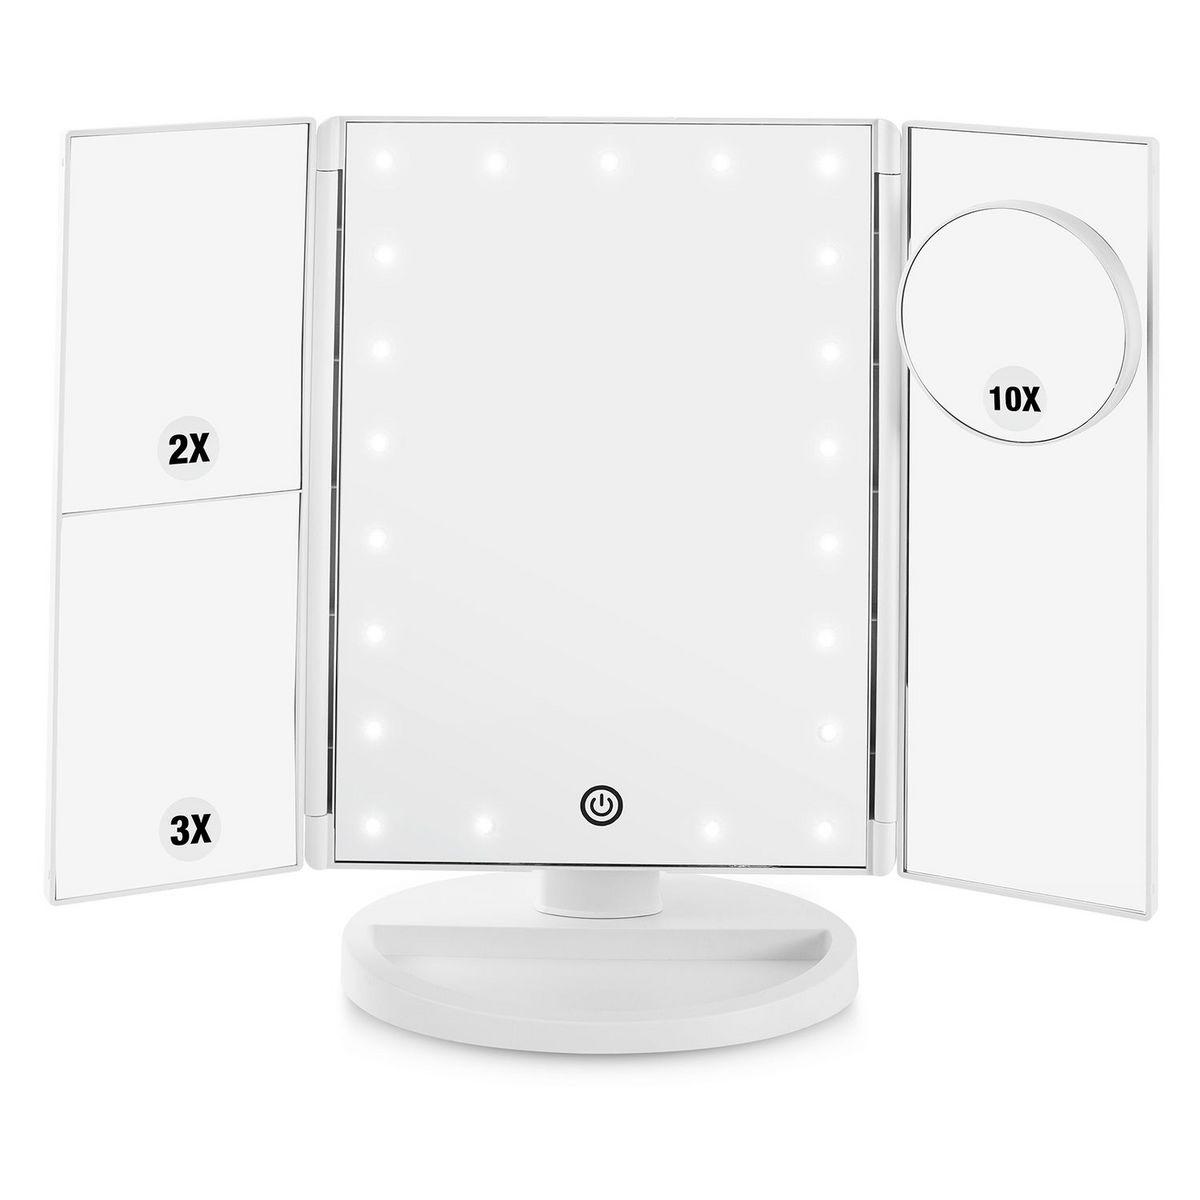 Miroir grossissant Tripty3 - Lumineux 21 LED